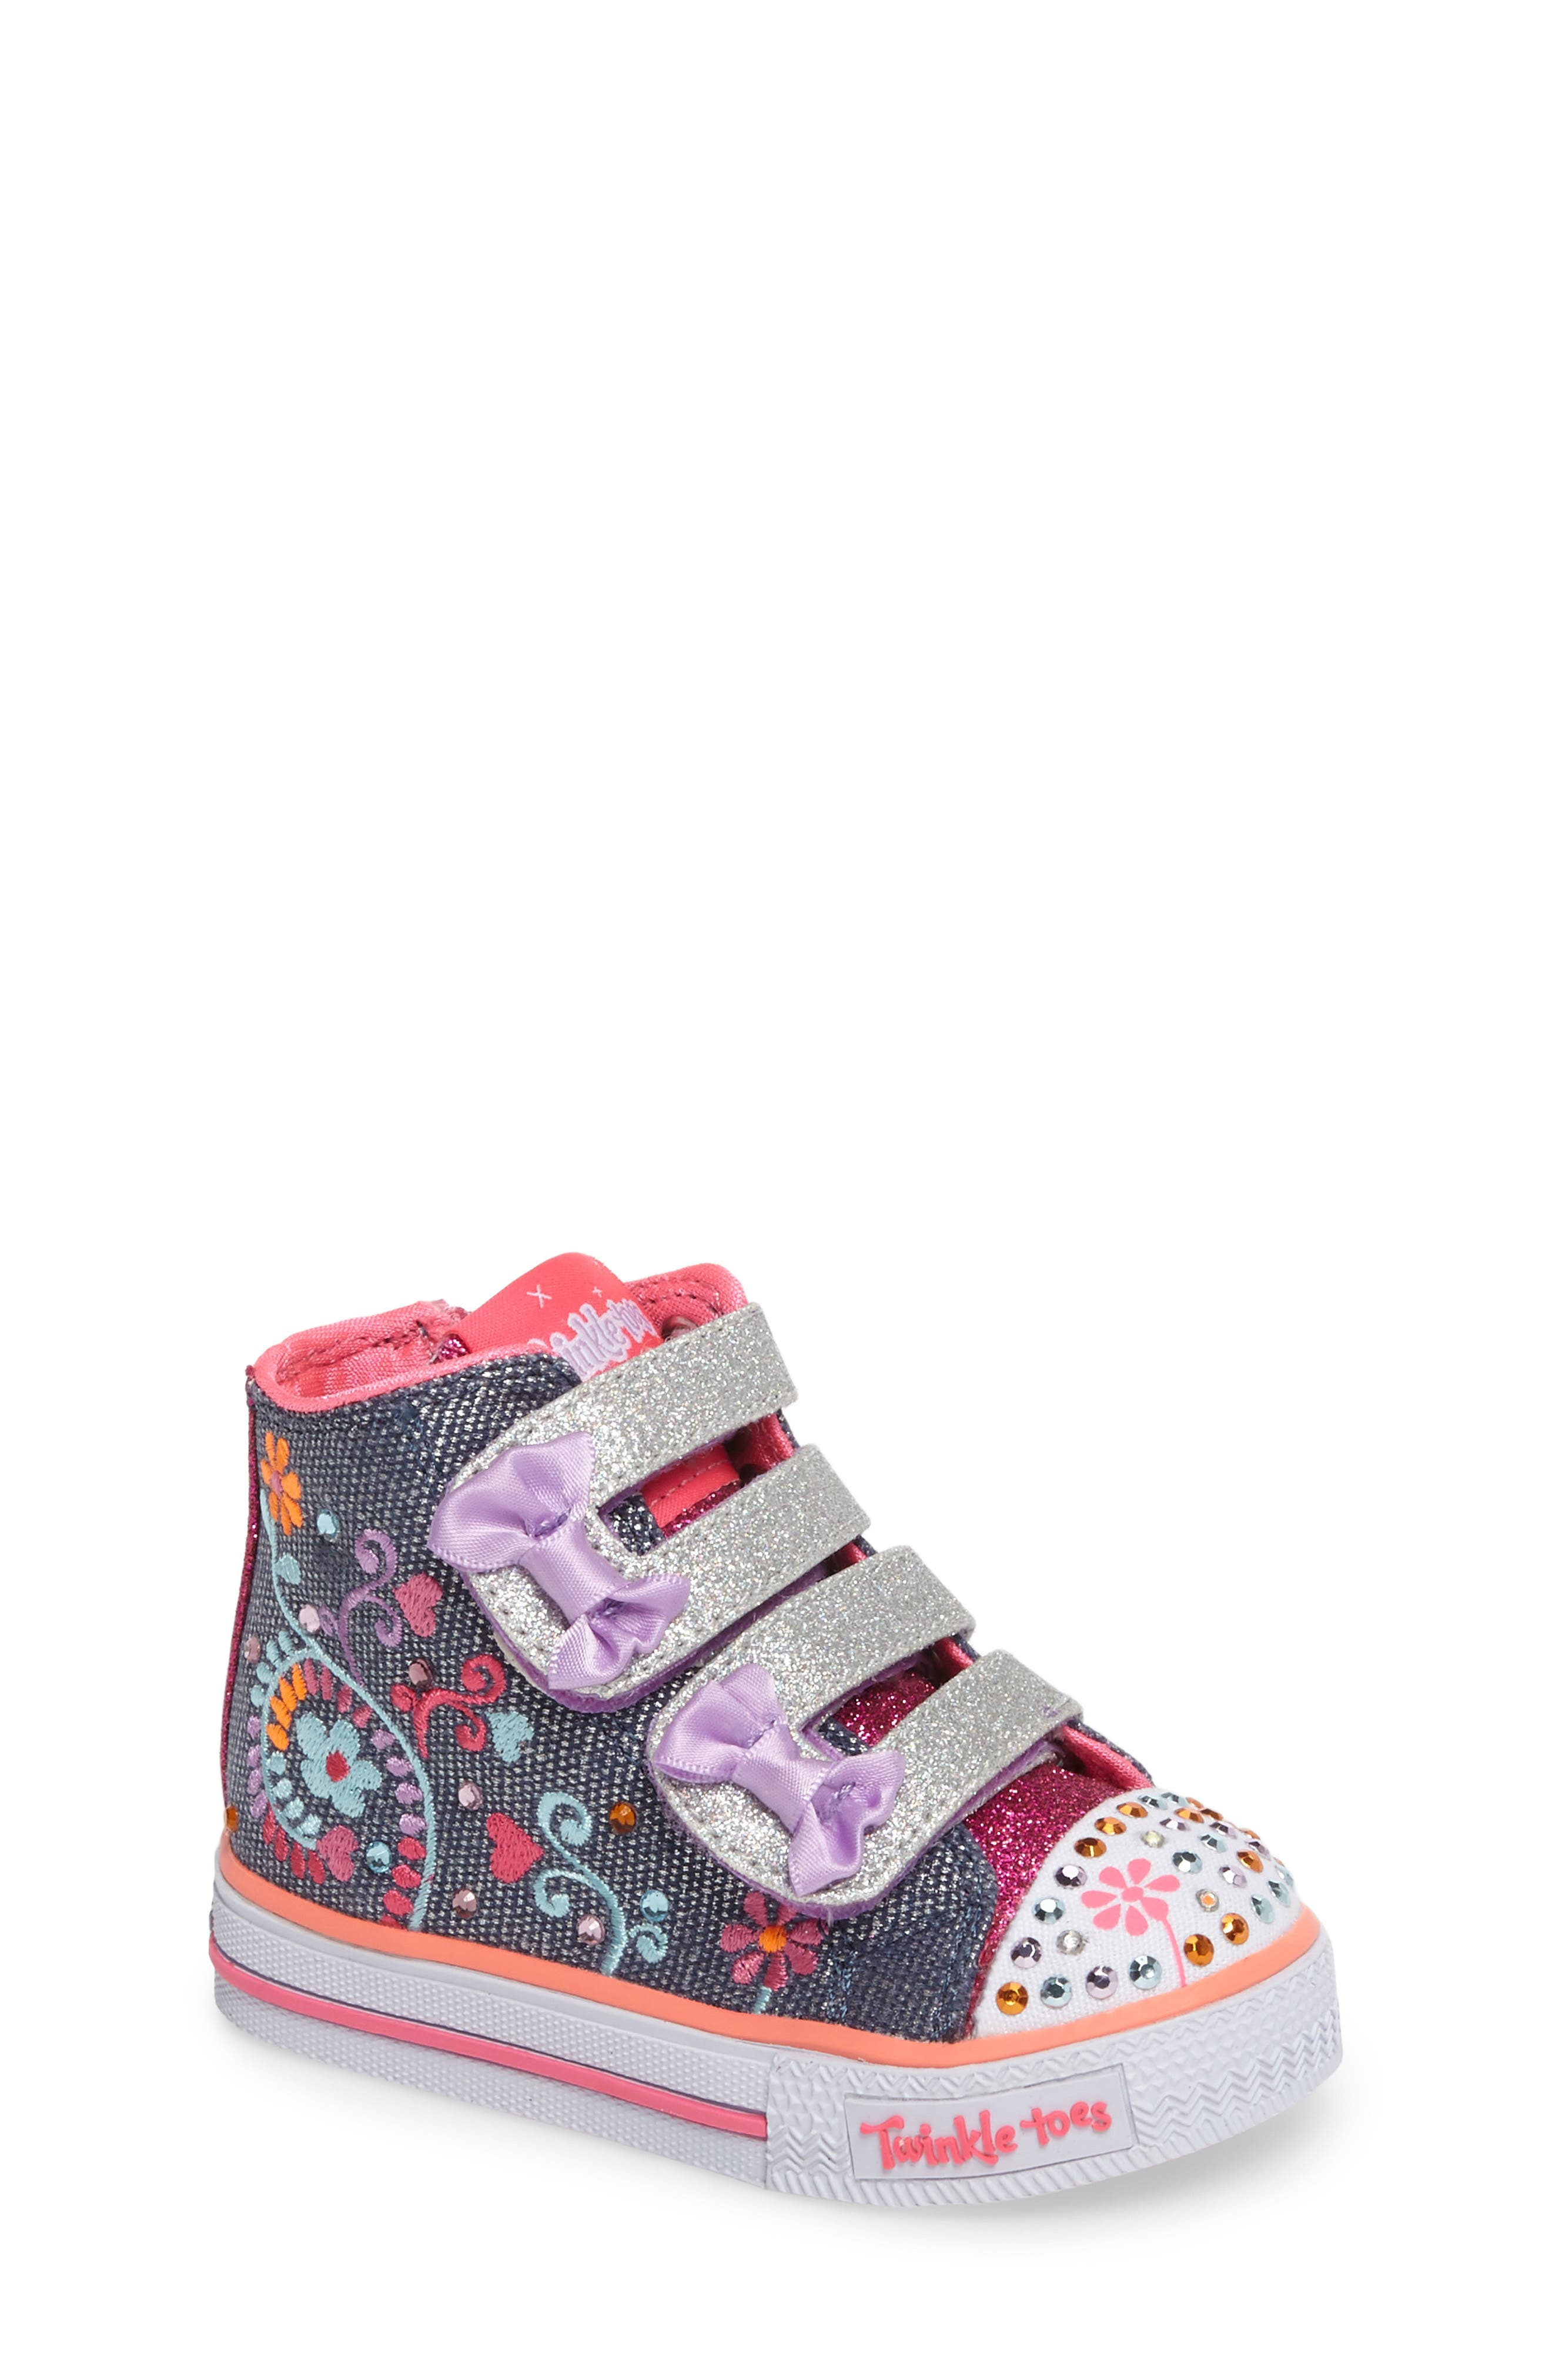 Shuffles Sneaker,                         Main,                         color, 468